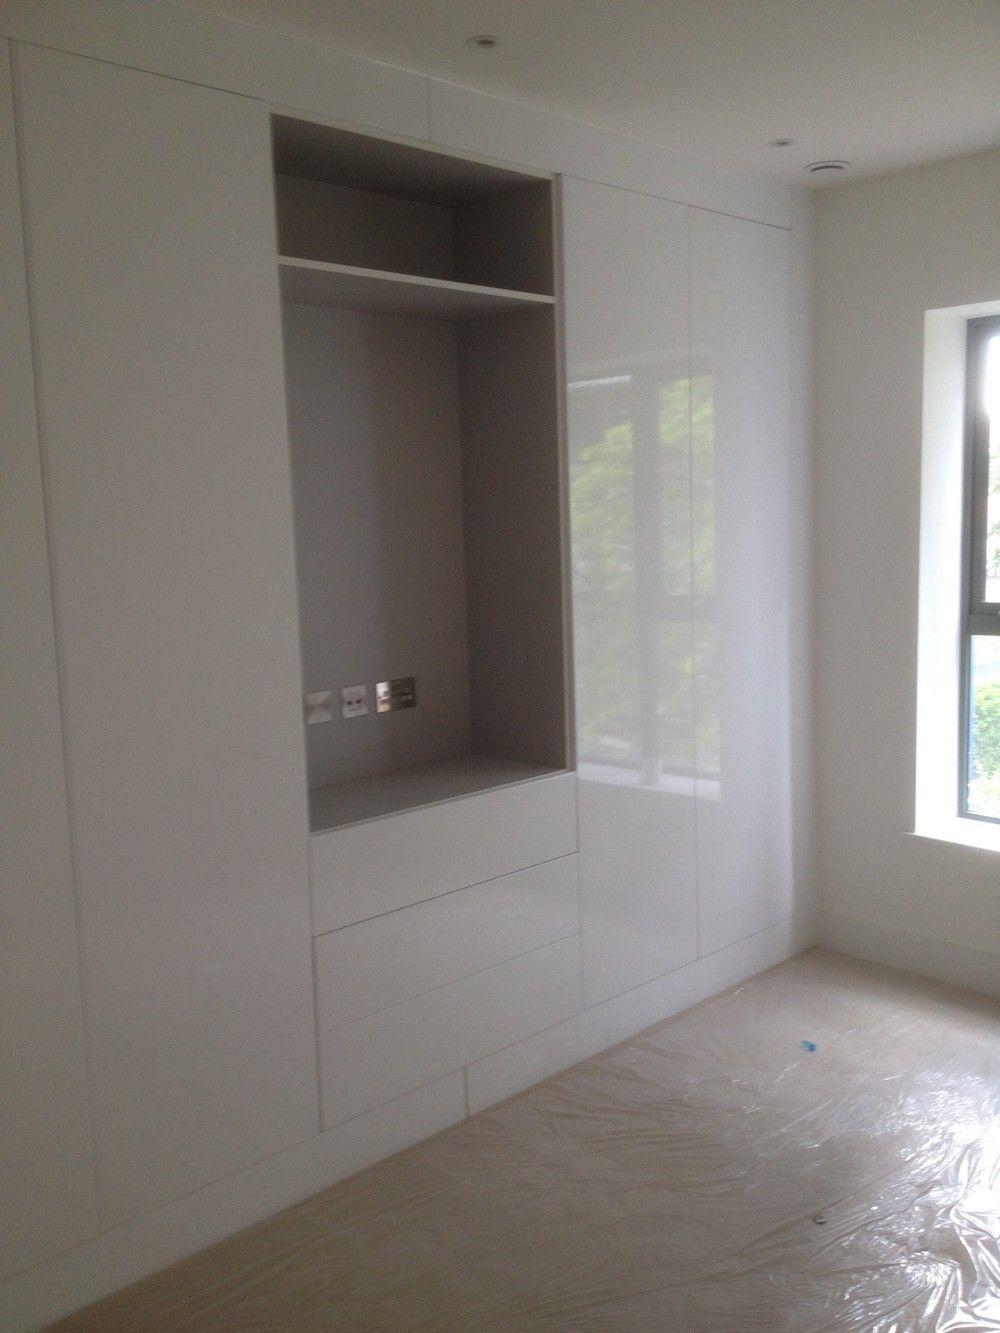 san francisco e9aac 0b56e Wardrobe Doors, Replacement Wardrobe Doors, Fitted   K & C's ...